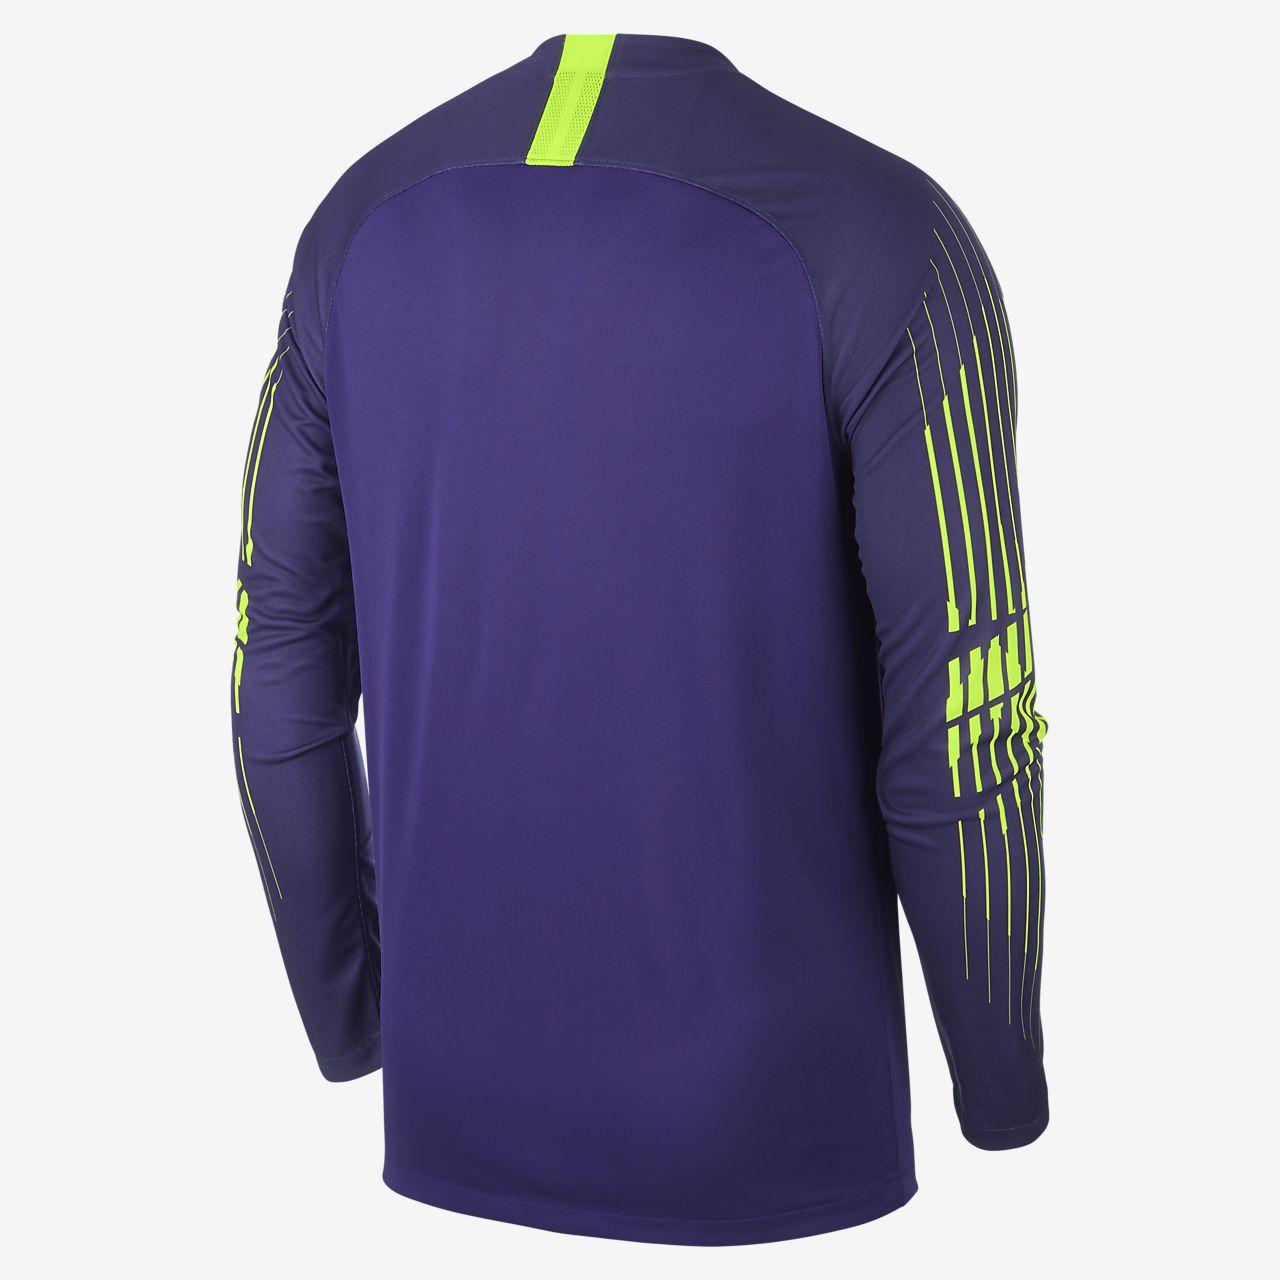 51a717895 ... Camisola de futebol de manga comprida 2018 19 Tottenham Hotspur Stadium  Goalkeeper para homem